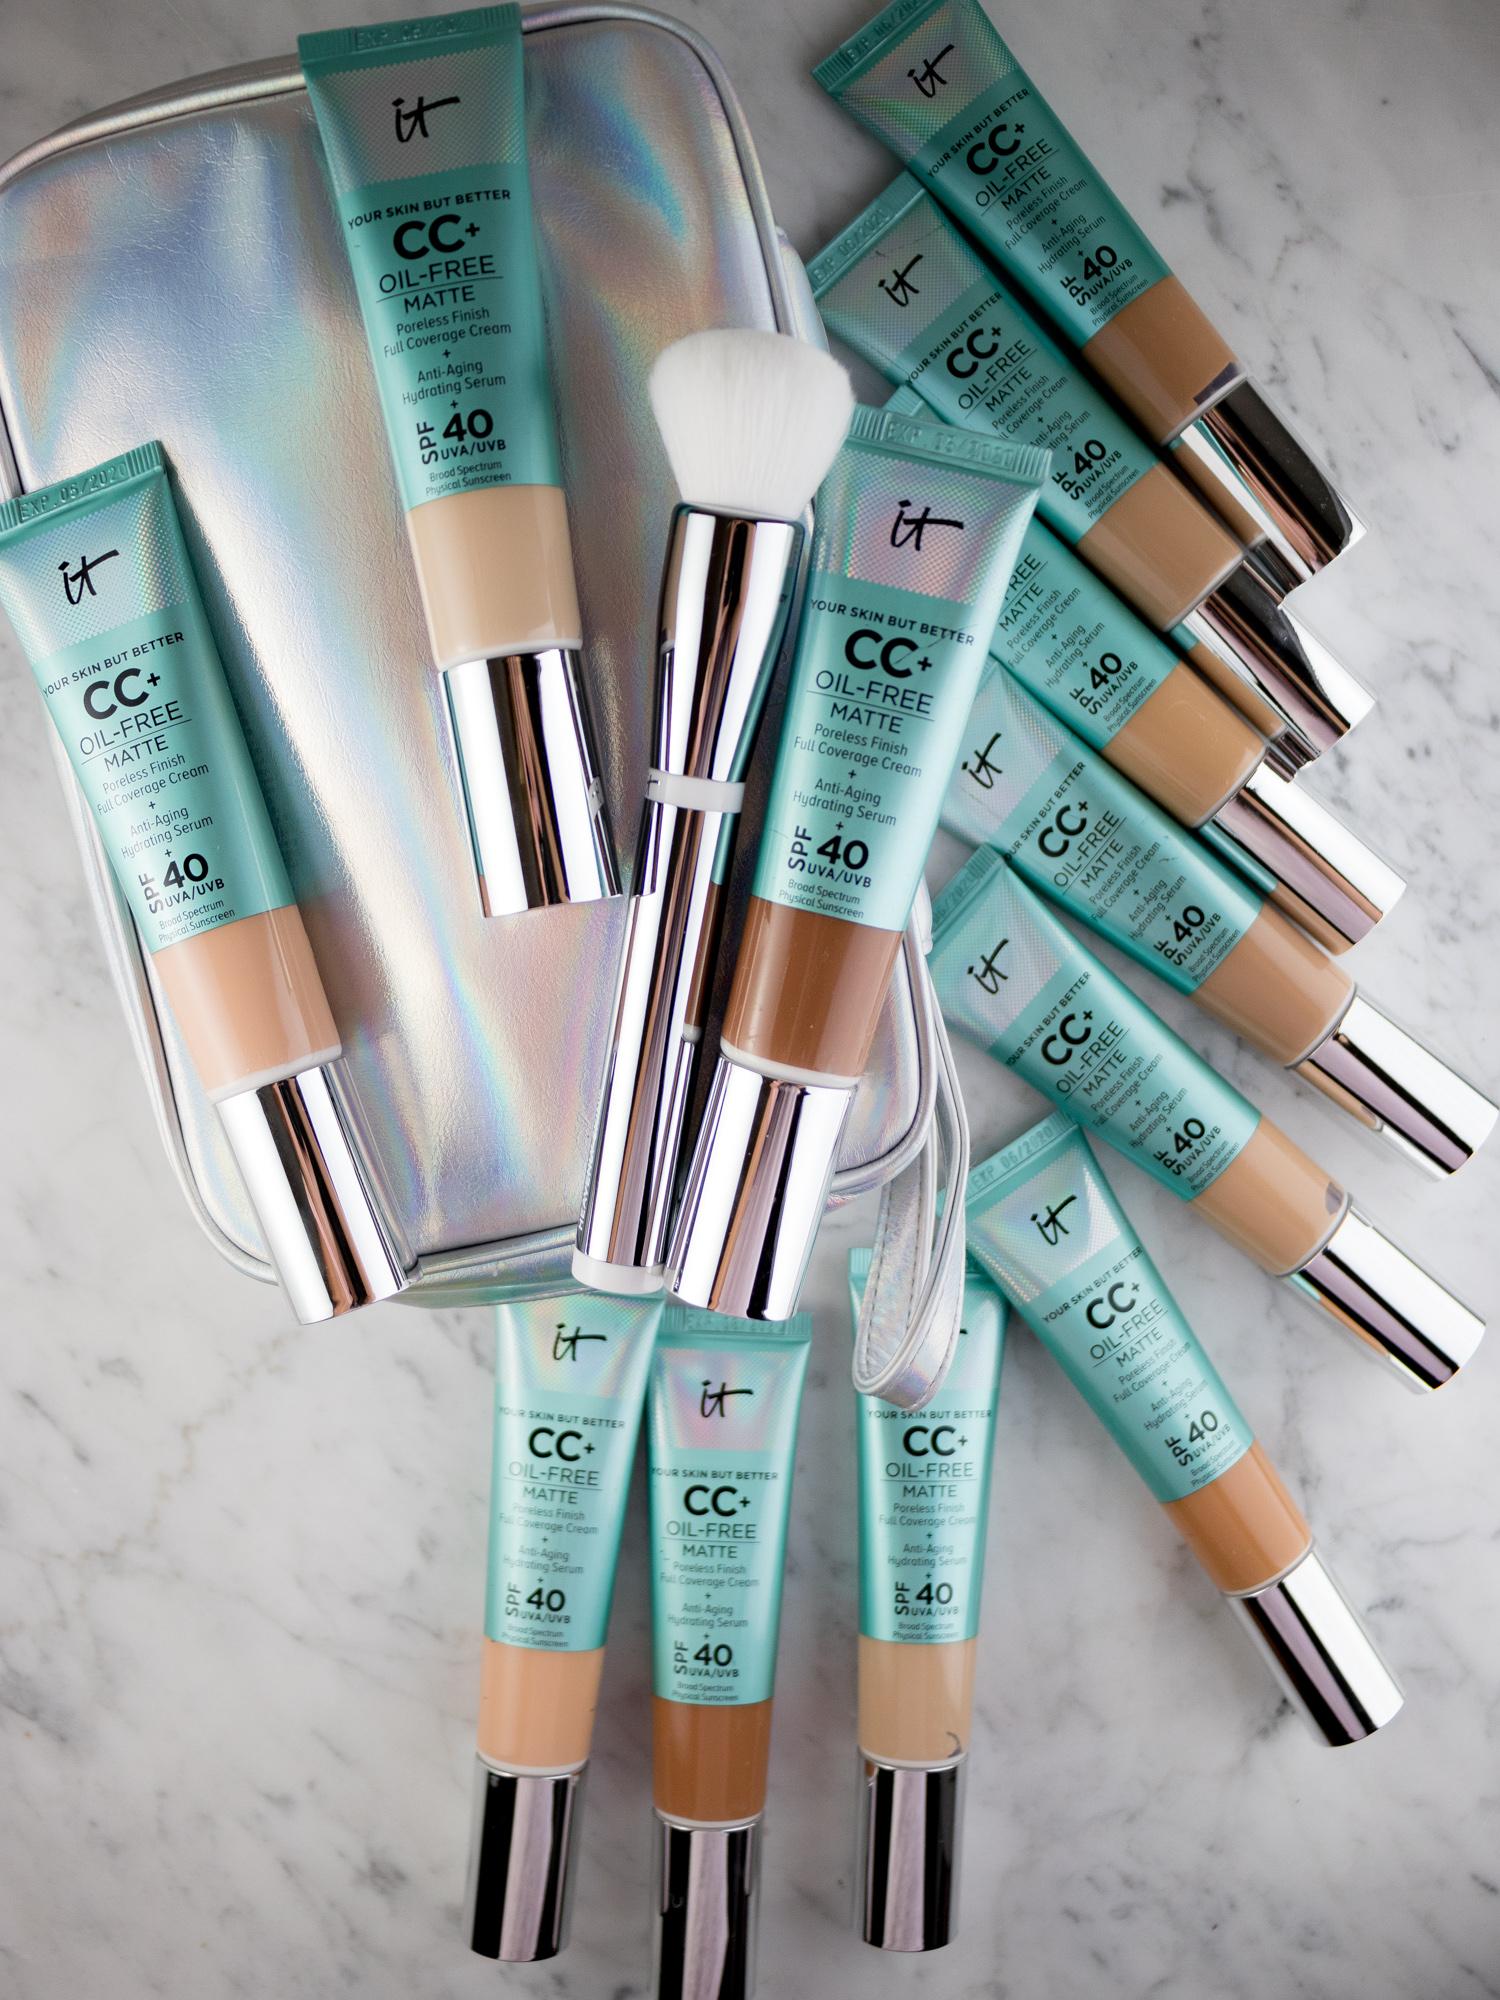 IT Cosmetics CC+ Cream Oil-Free Matte — Every Shade!